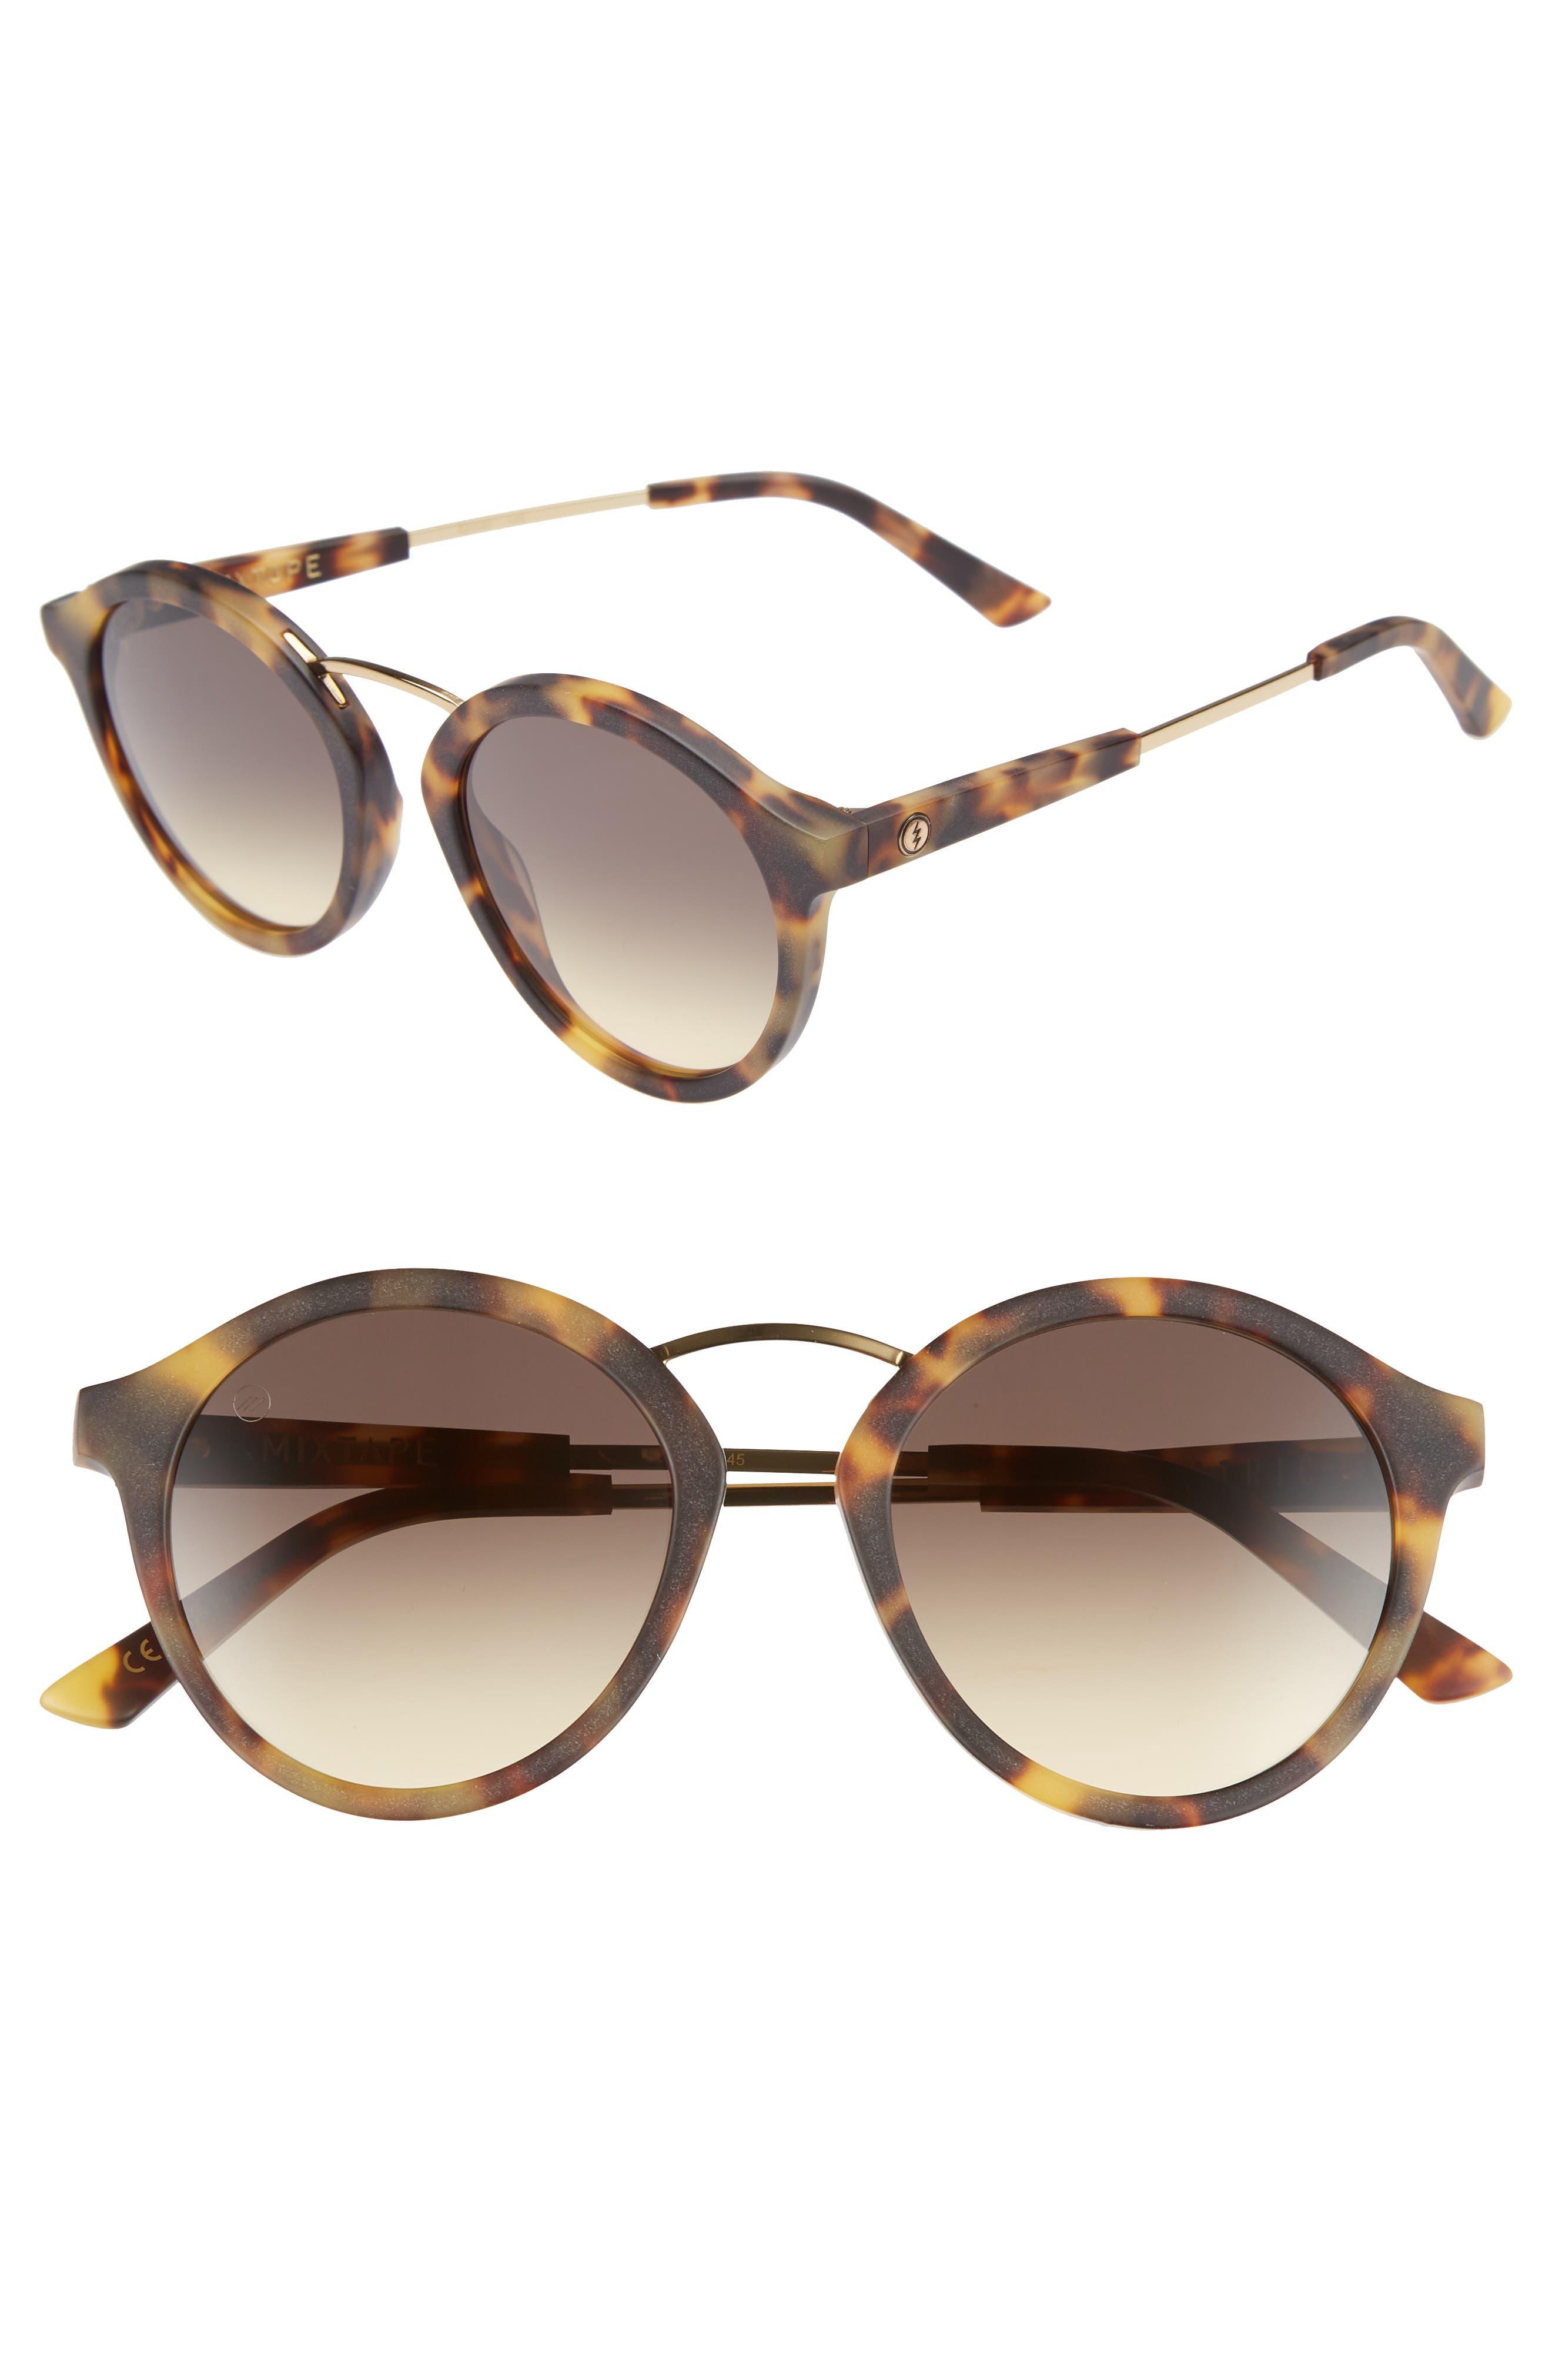 Mix Tape 52mm Mirrored Round Sunglasses,                             Main thumbnail 1, color,                             MATTE TORTOISE/ BLACK GRADIENT